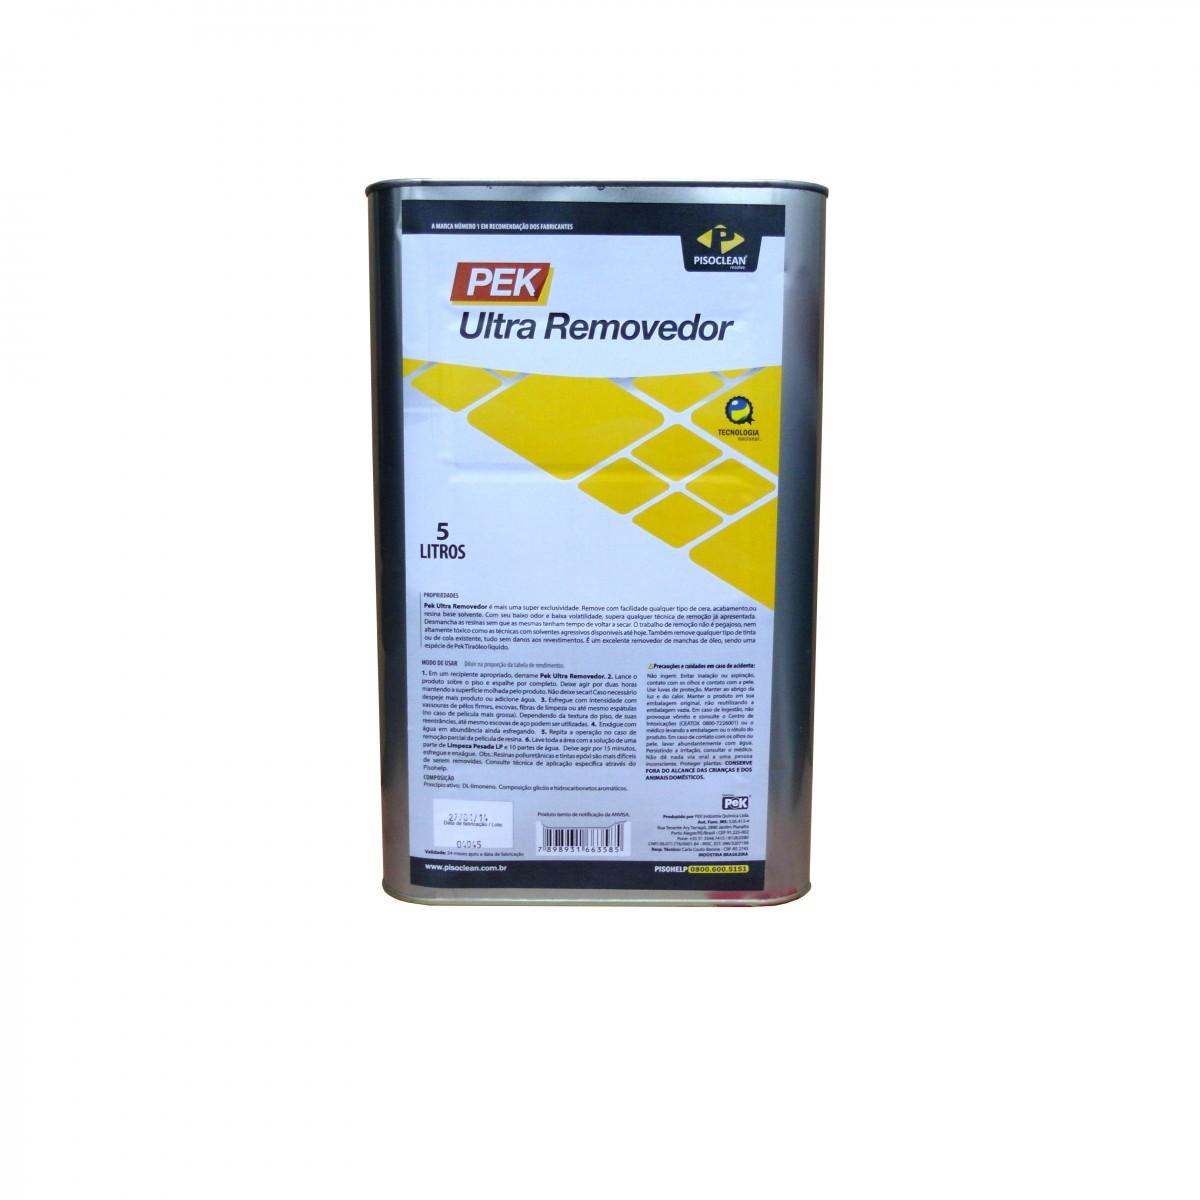 Pek Ultra Removedor De Resinas 5L  - COLAR